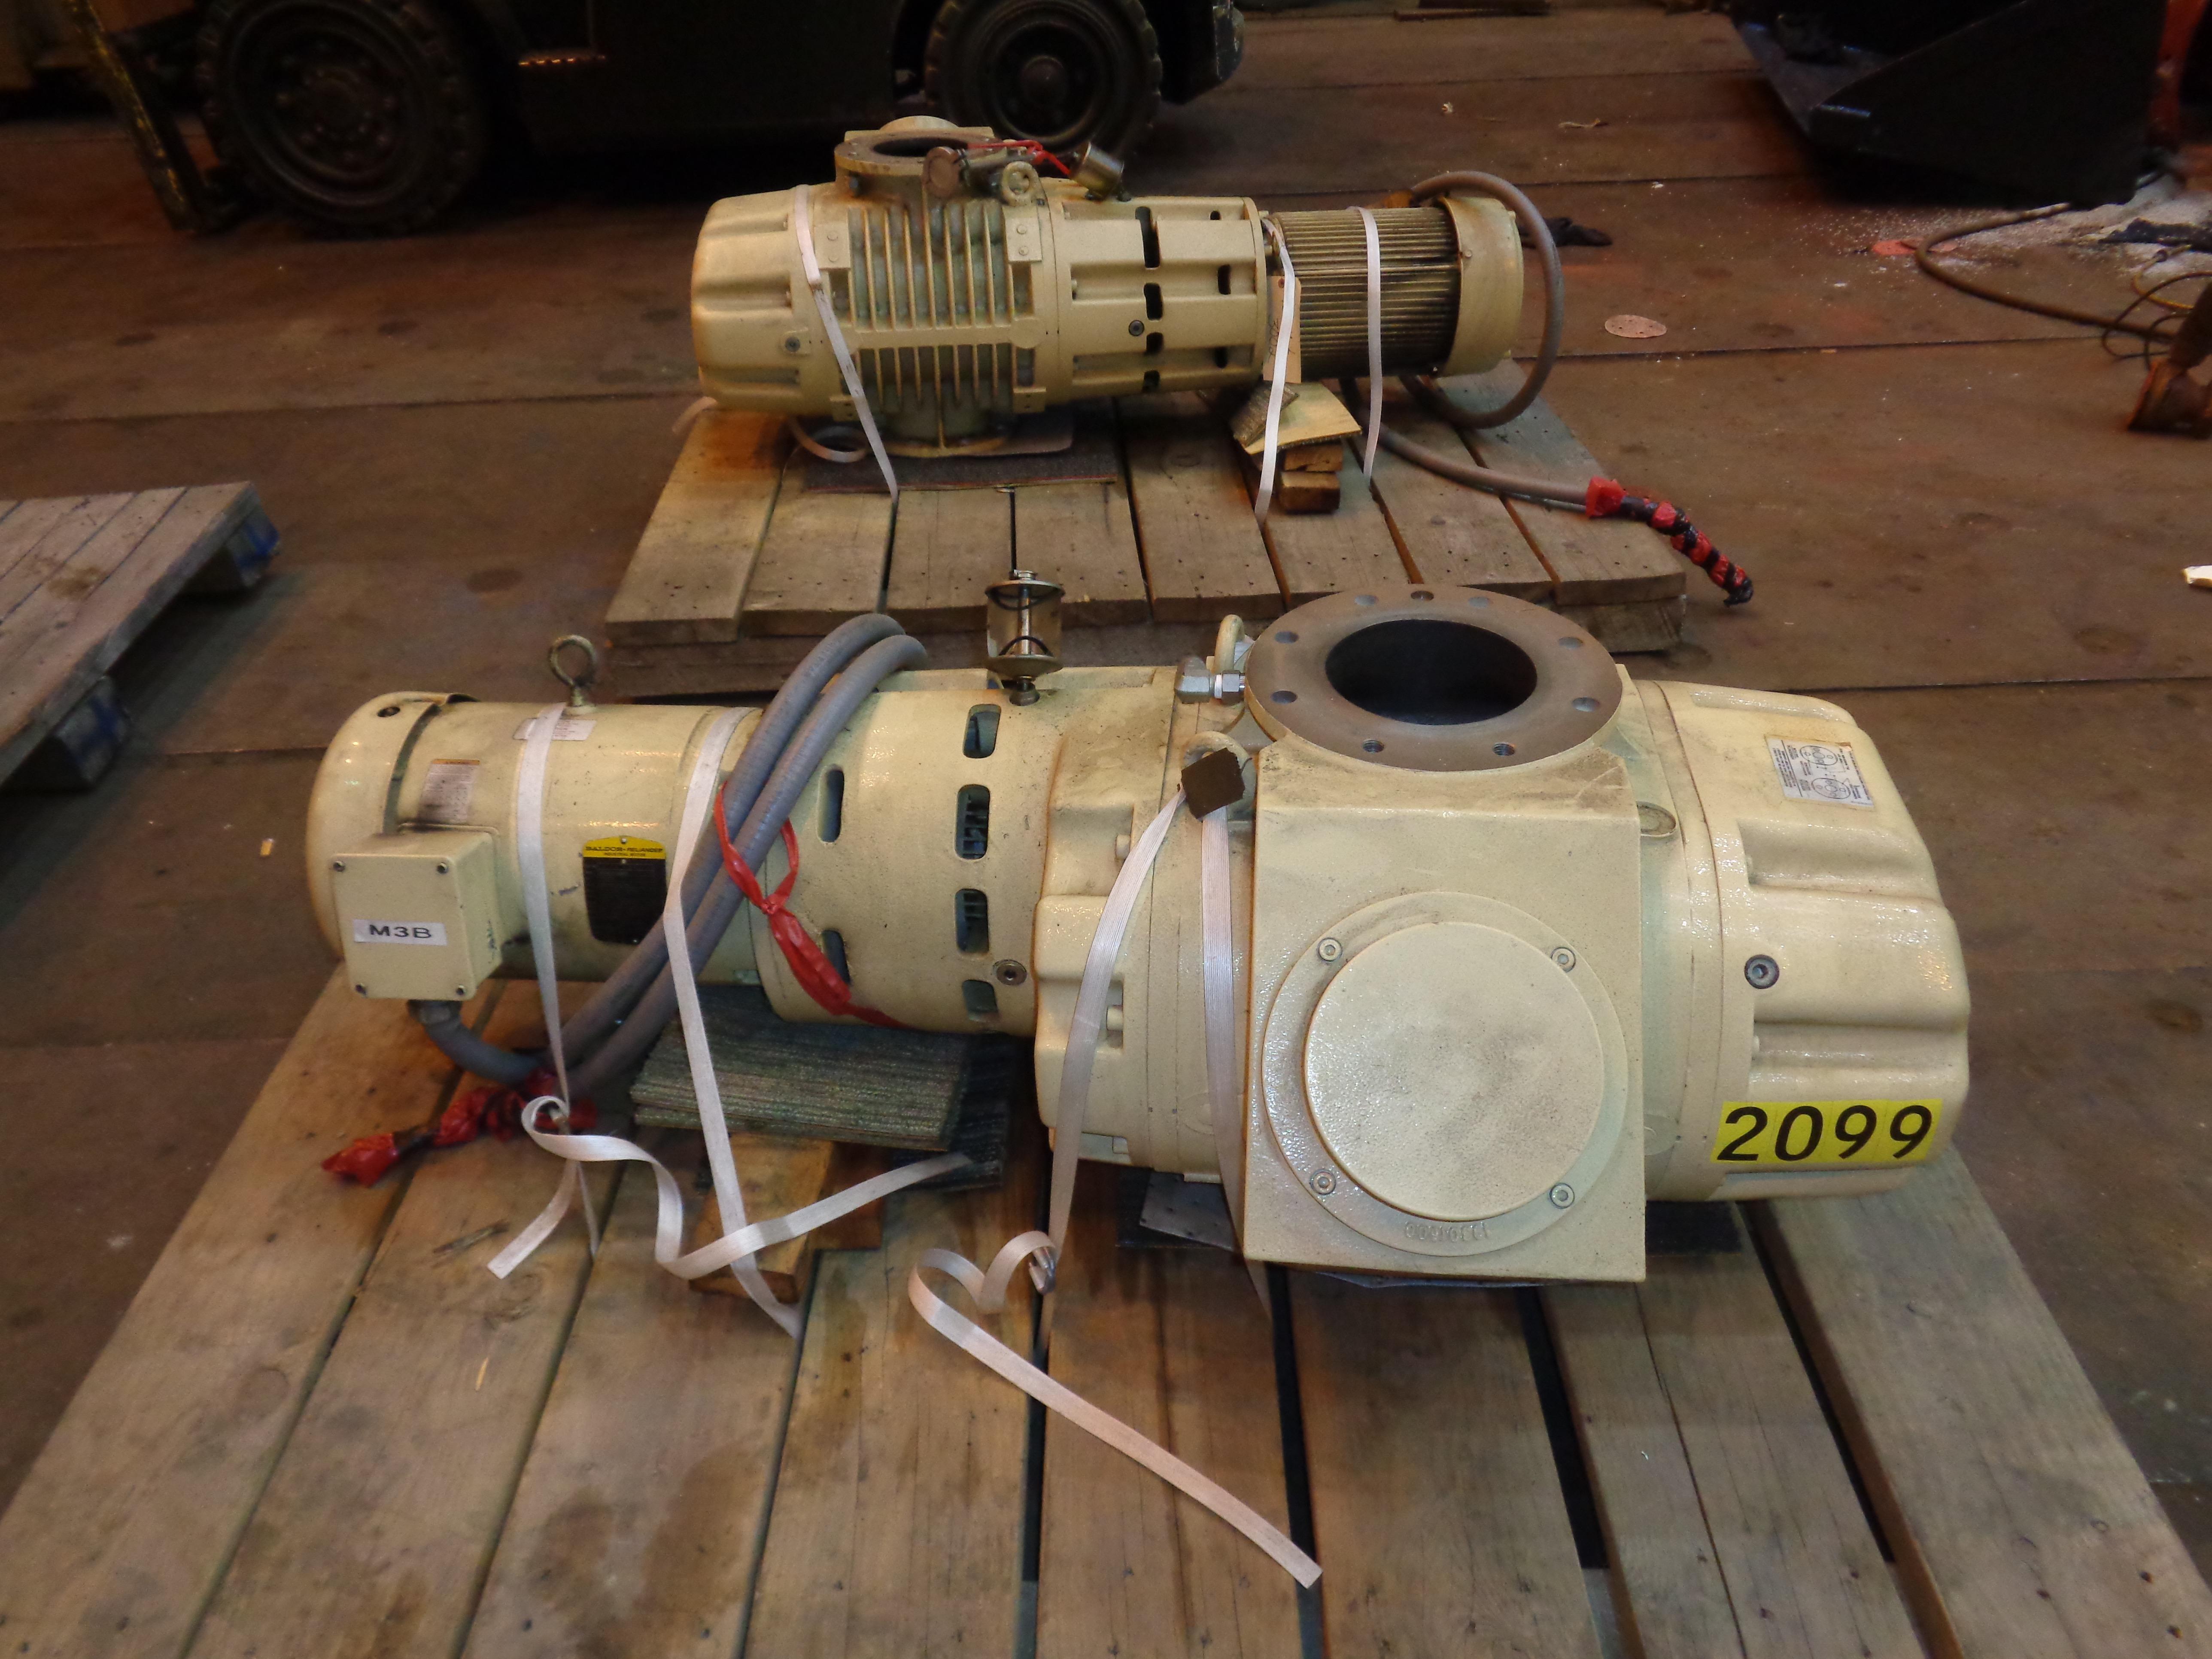 Lot of 3 Vacuum Pumps - Image 16 of 26